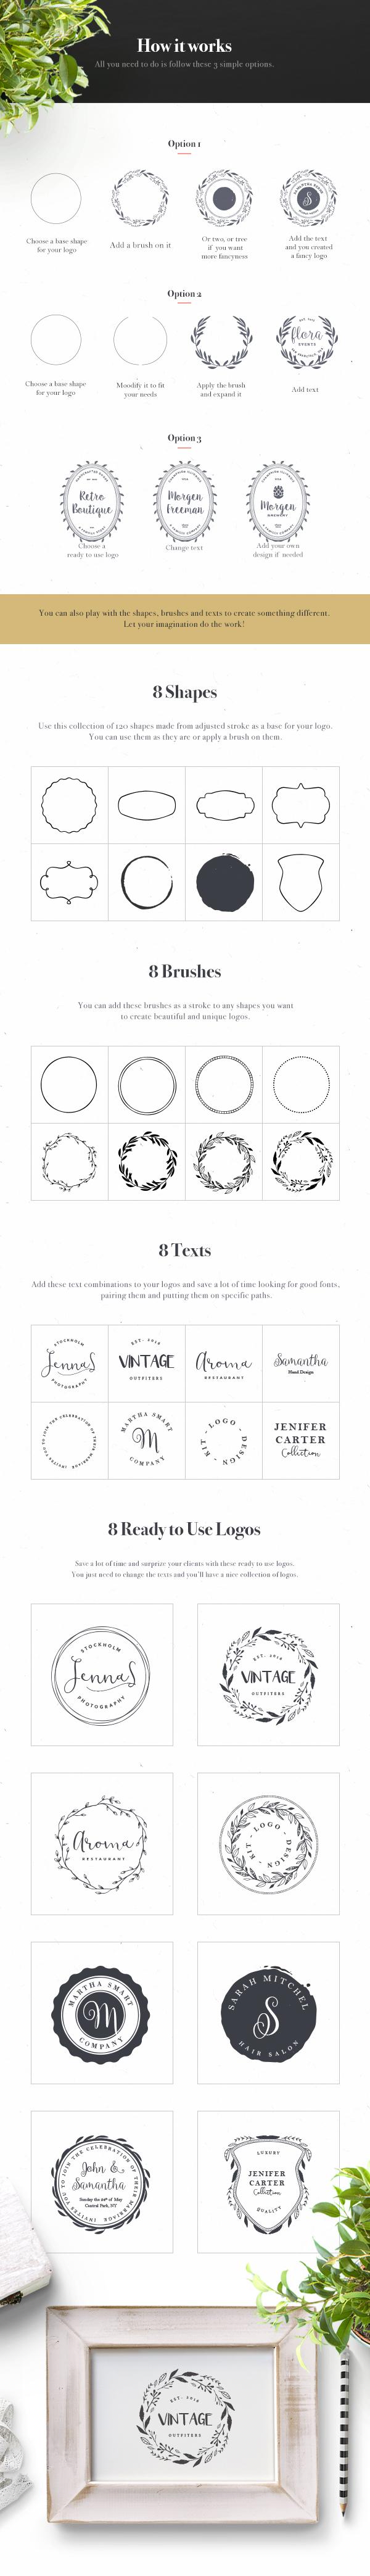 Logo Design Kit – Free Sample | GraphicBurger